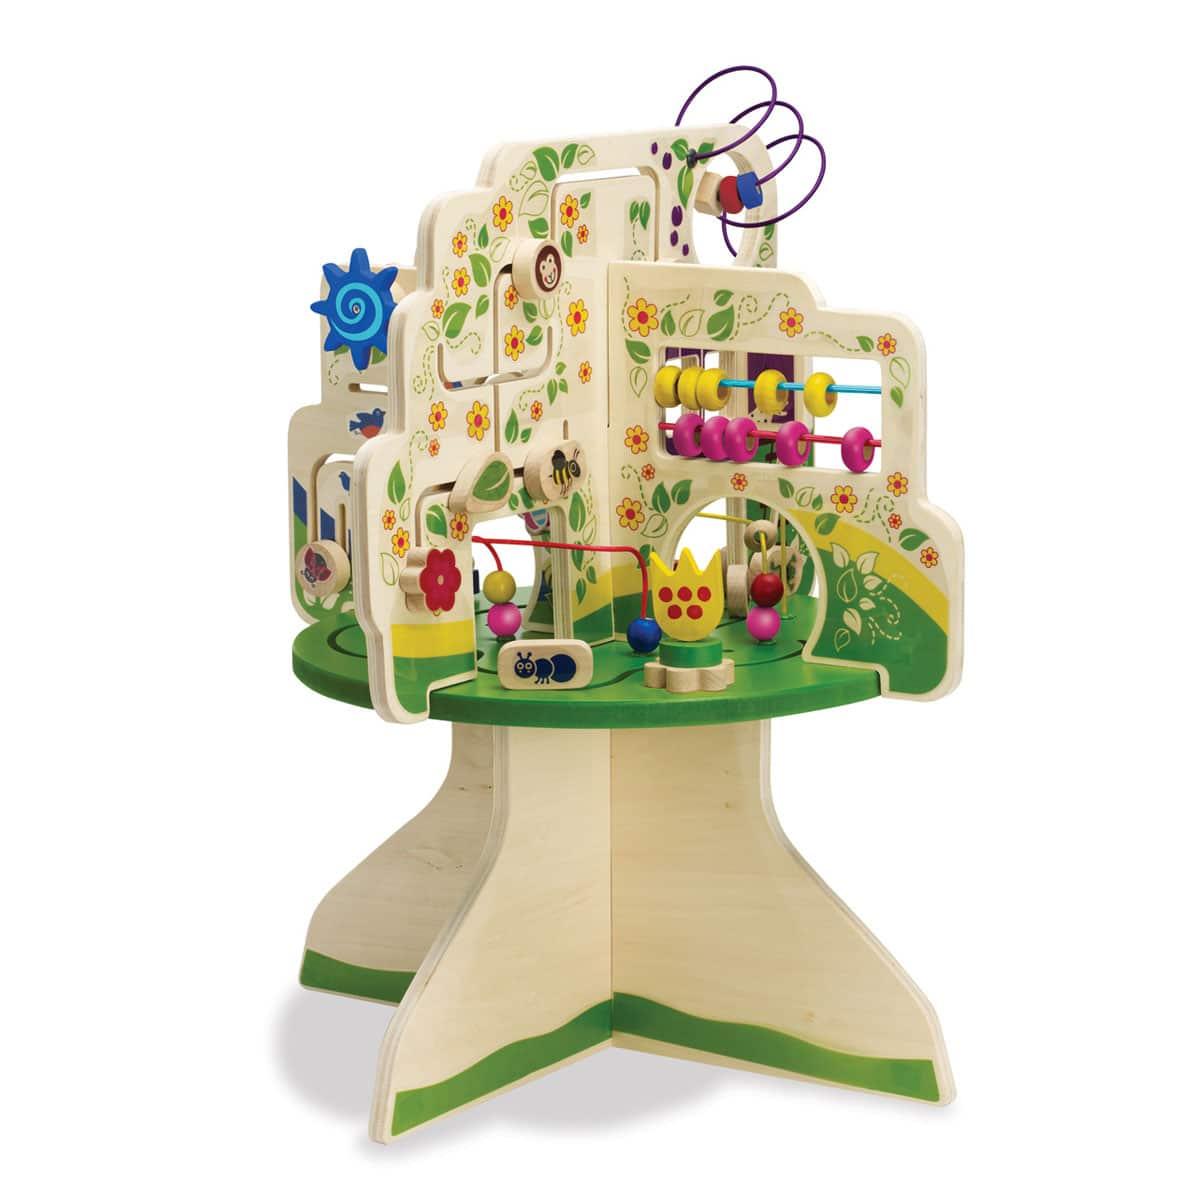 table-eveil-arbre-boulier-manhattan-toy